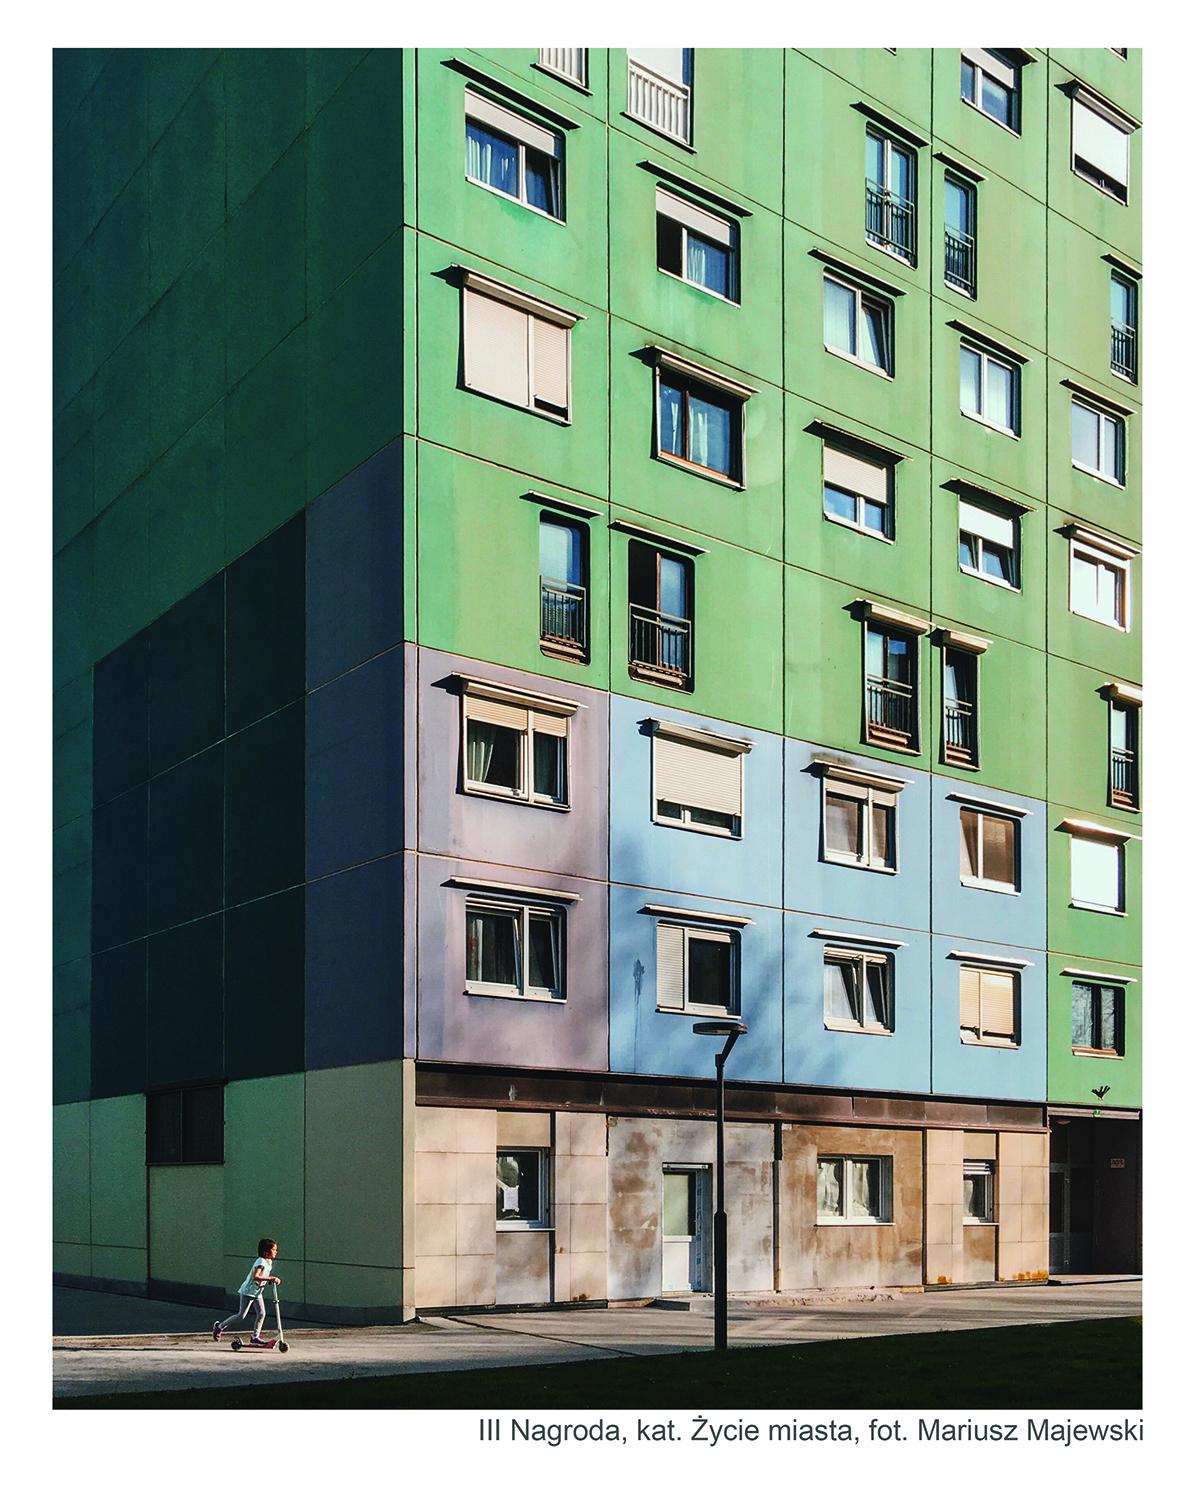 III Nagroda, fot. Mariusz Majewski